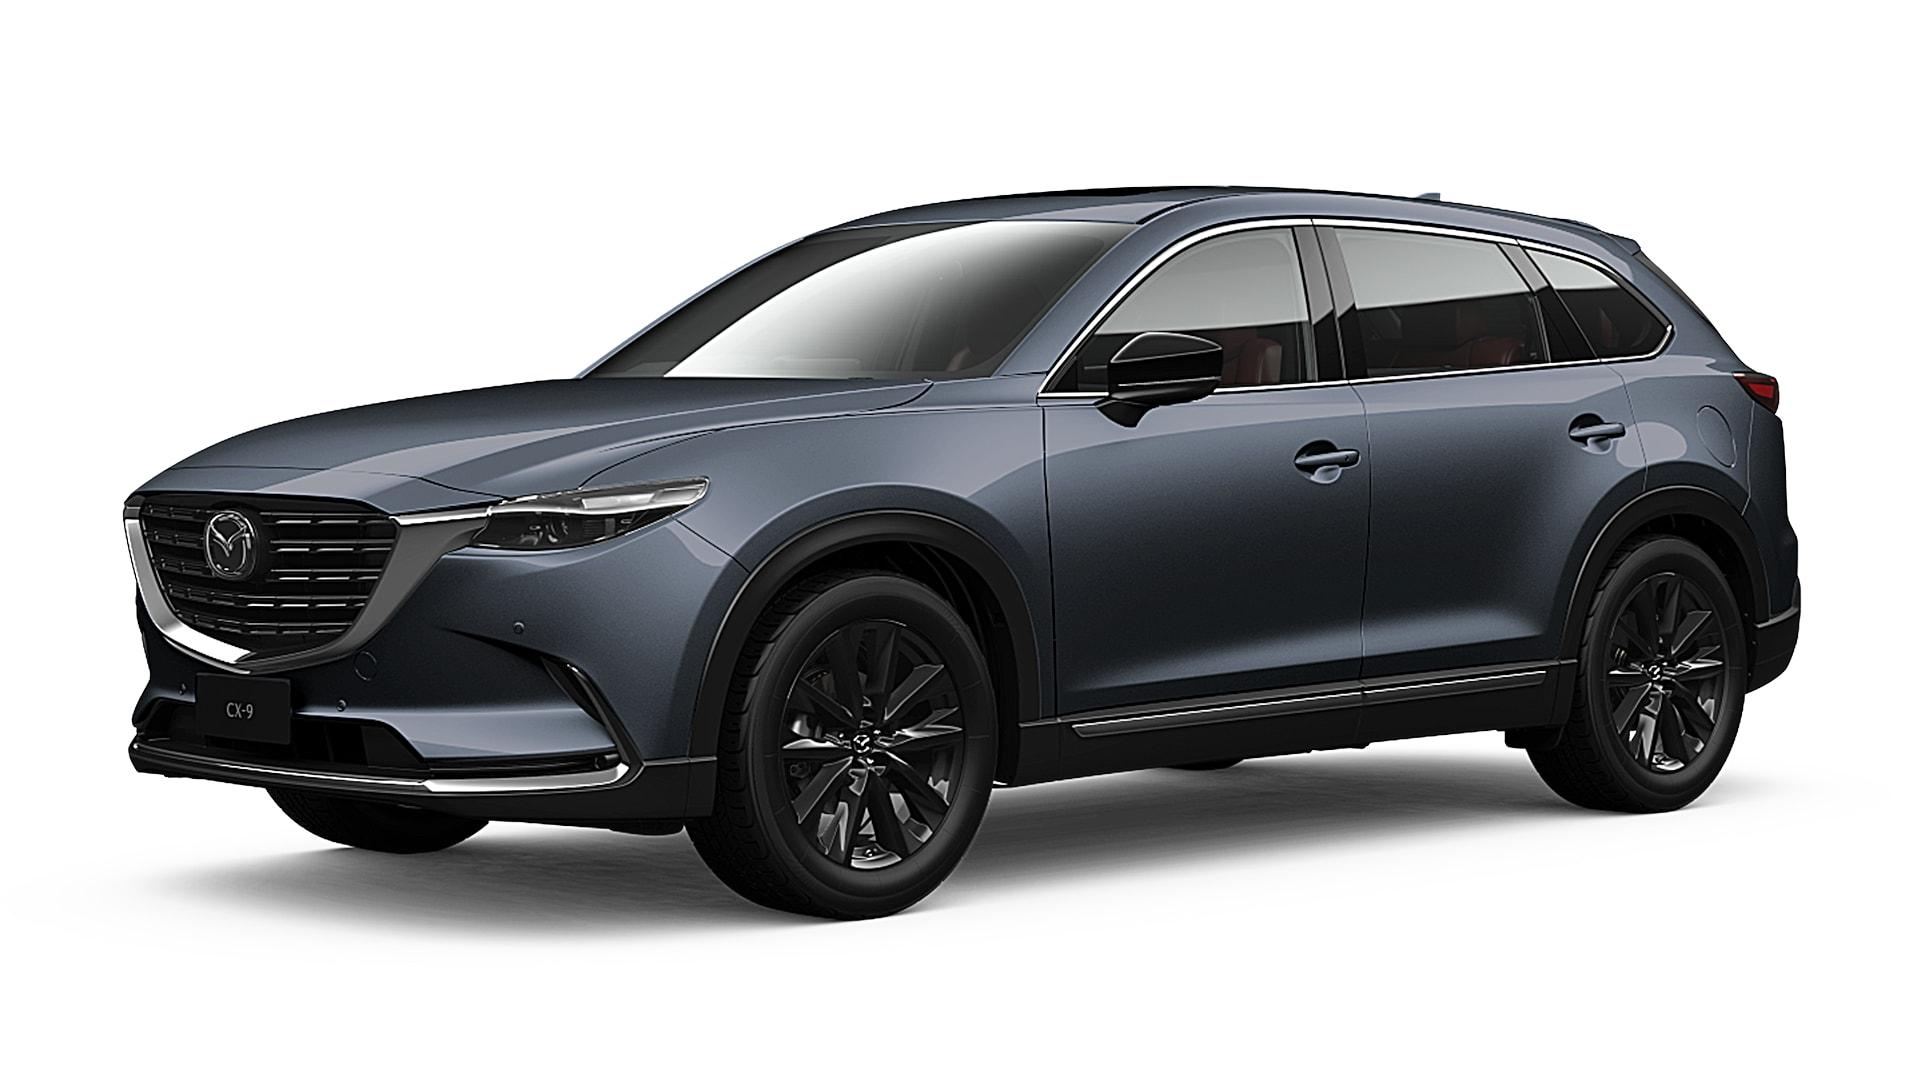 /vehicles/showrooms/models/mazda-cx-9